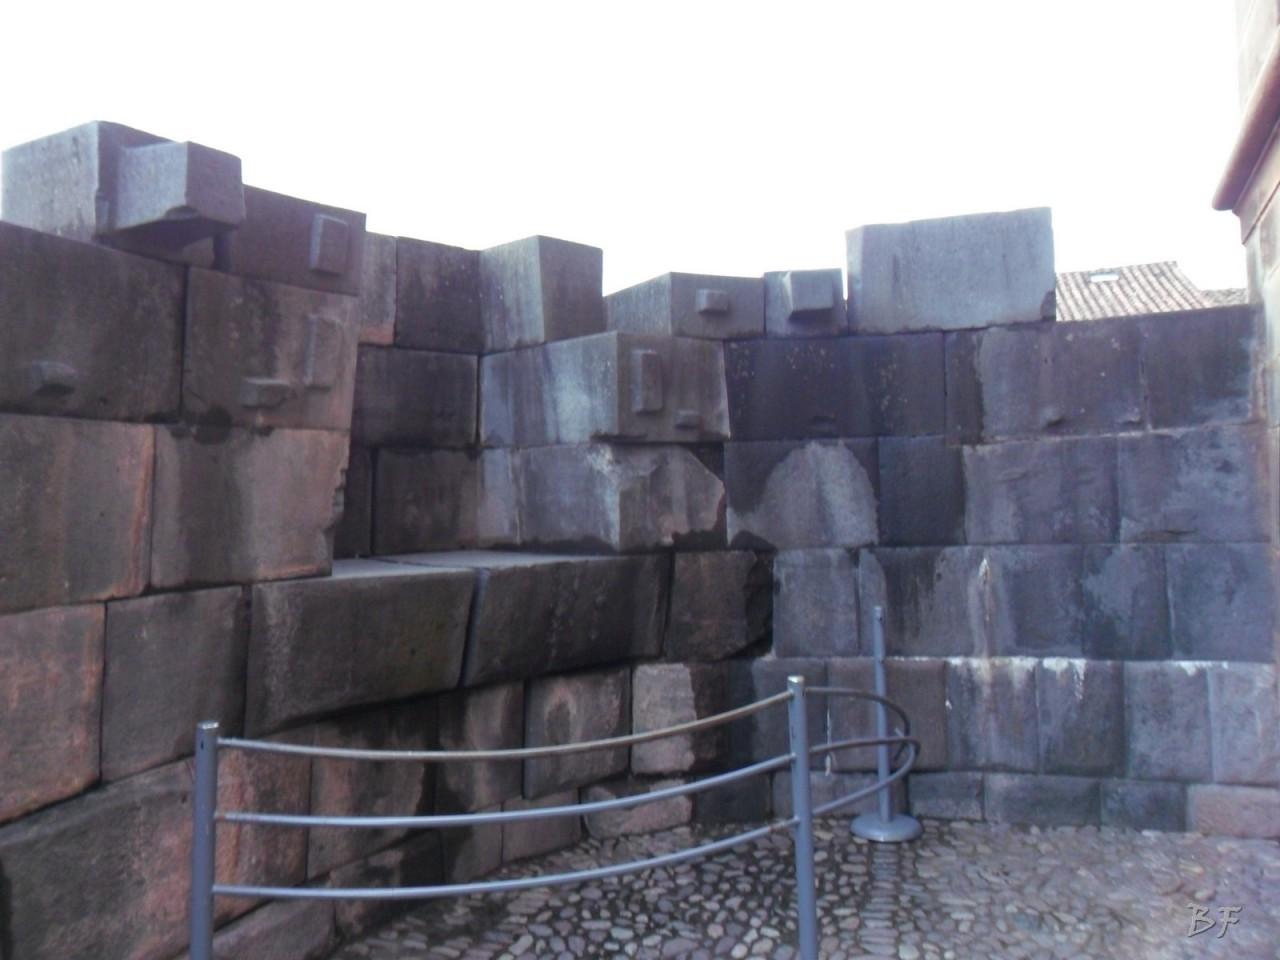 Mura-Poligonali-Megaliti-Tempio-Coricancha-Cusco-Perù-52